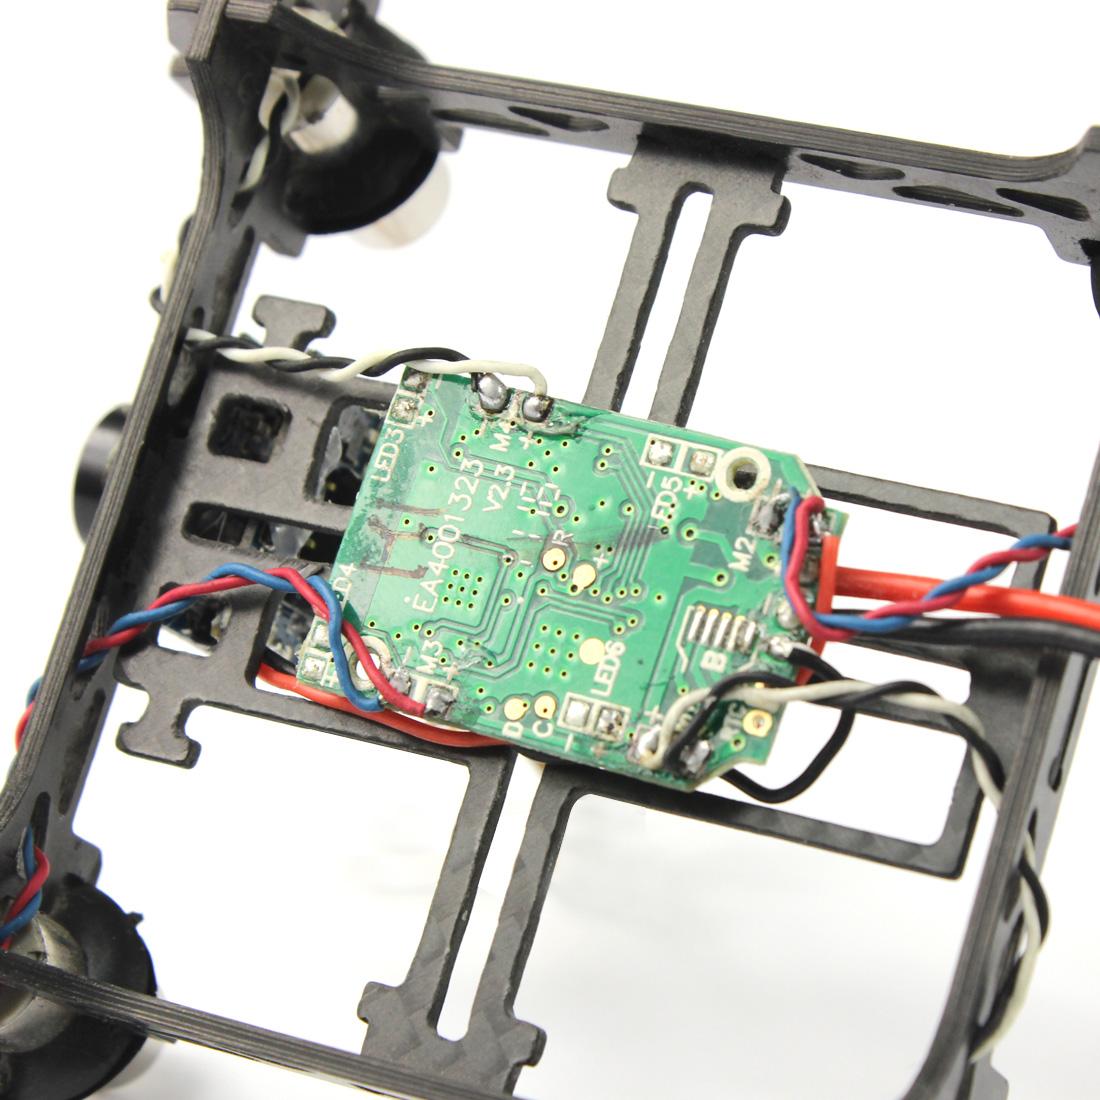 Mini Tiny QX80 80mm Carbon FPV Brushed Indoor RC Quadcopter DIY RTF Assemble Kit H107 Flight Control 5.8G 25mW Camera F19032-B/C